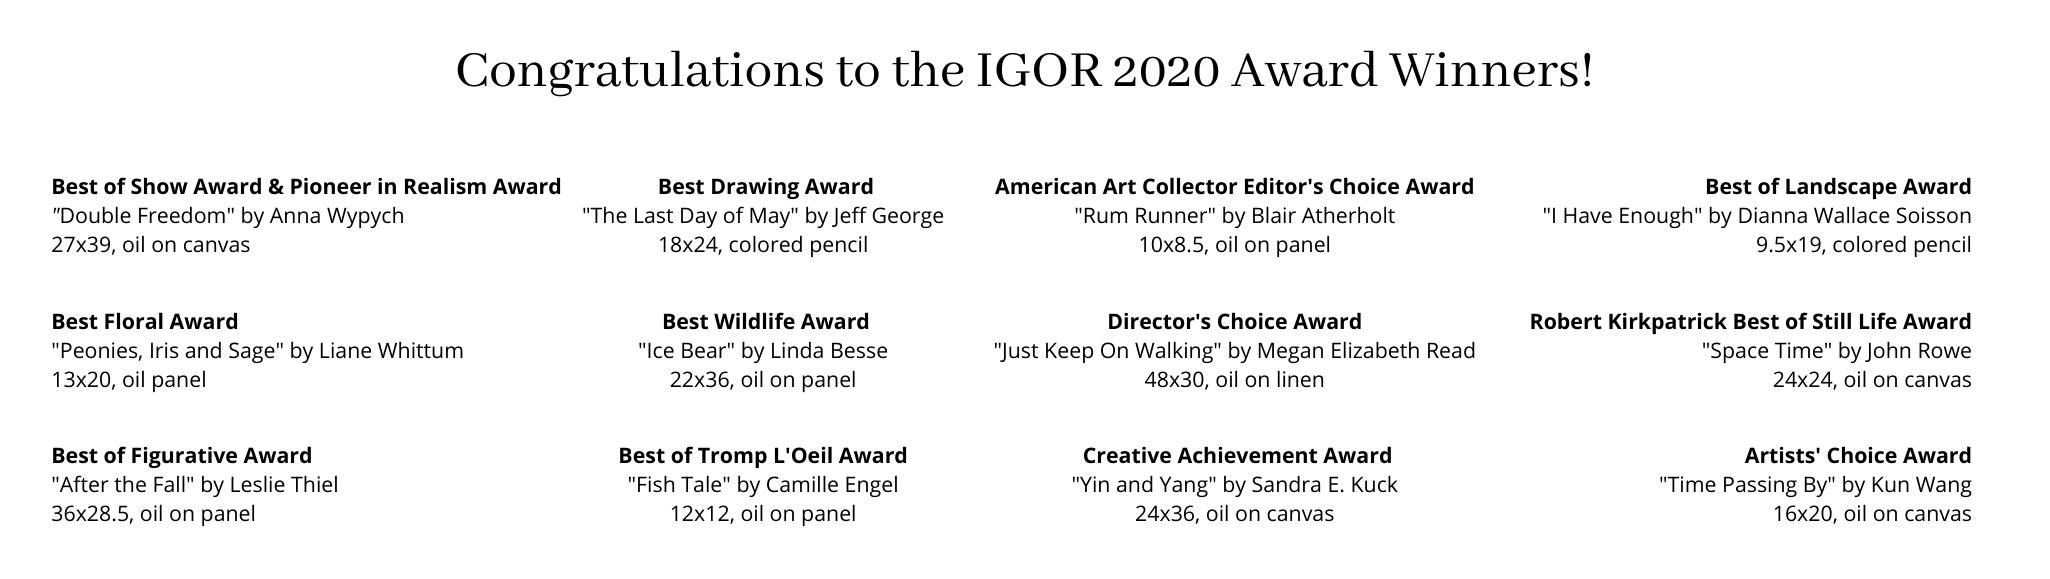 Congratulations to the IGOR 2020 Award Winners!